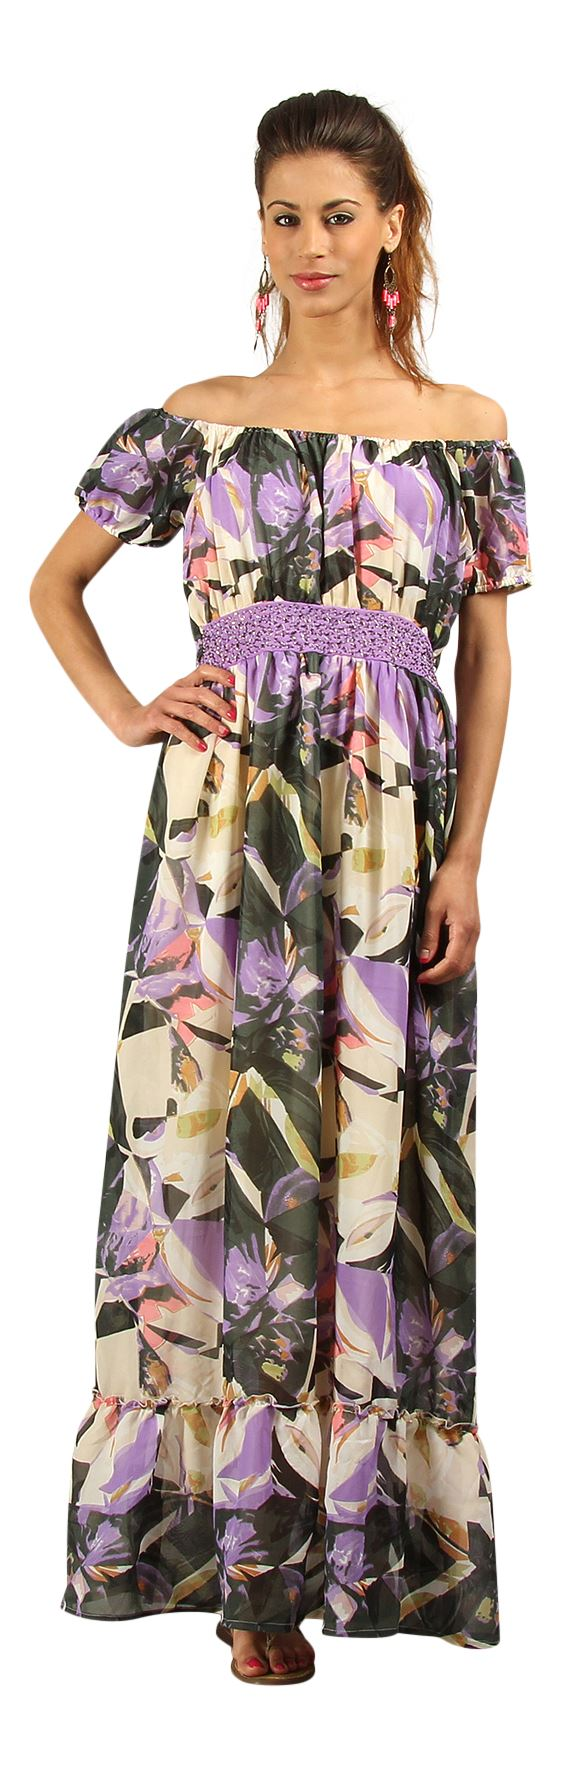 New-Kushi-Long-Boho-Festival-Gypsy-Summer-Chiffon-Maxi-Dress-Size-10-22